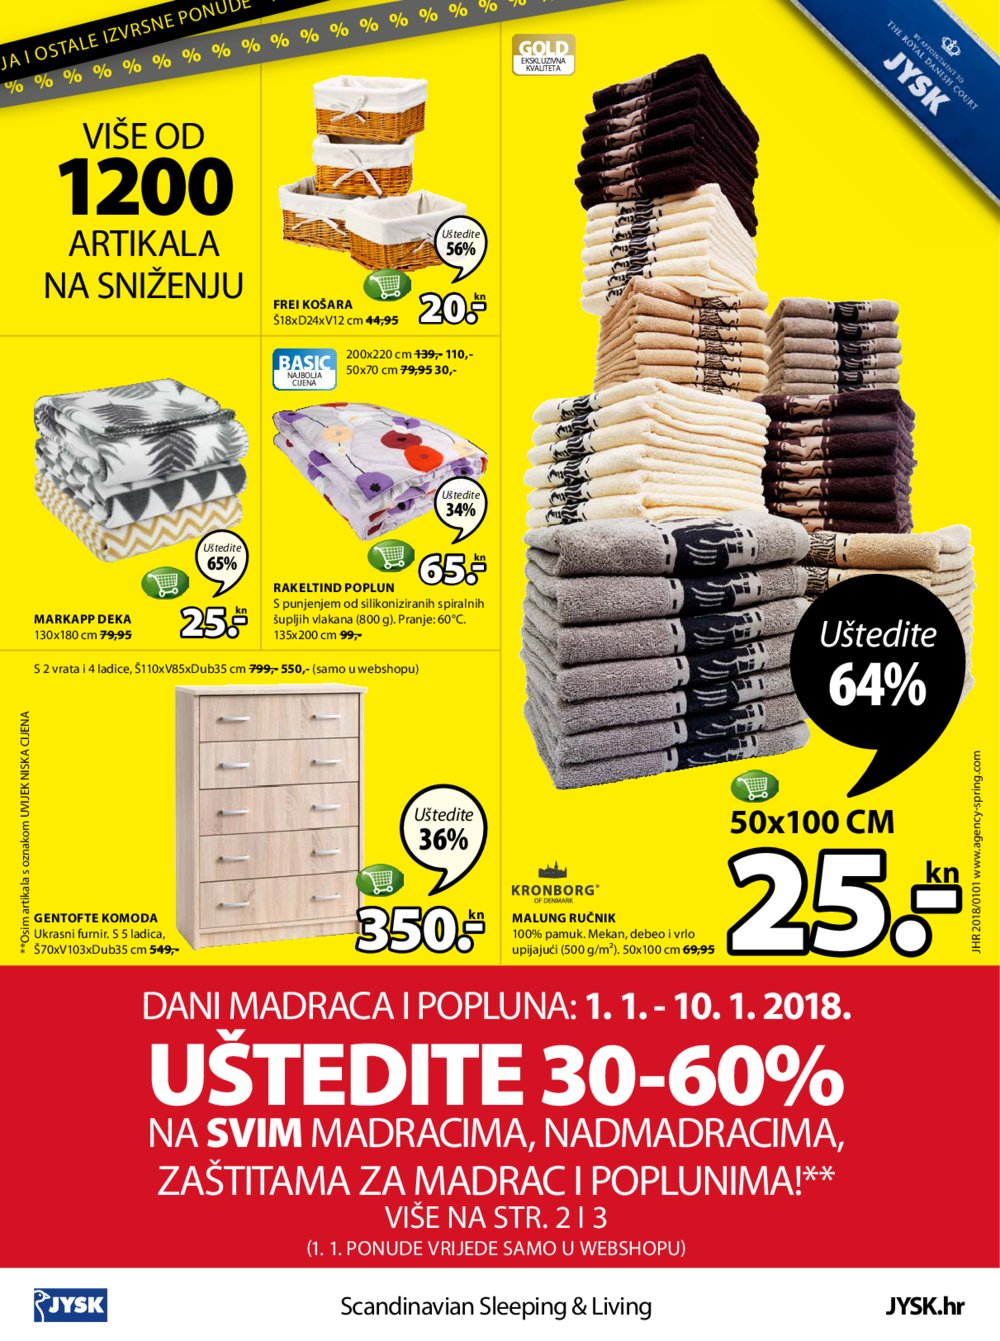 JYSK katalog Akcija 25.12.-17.01.2017.